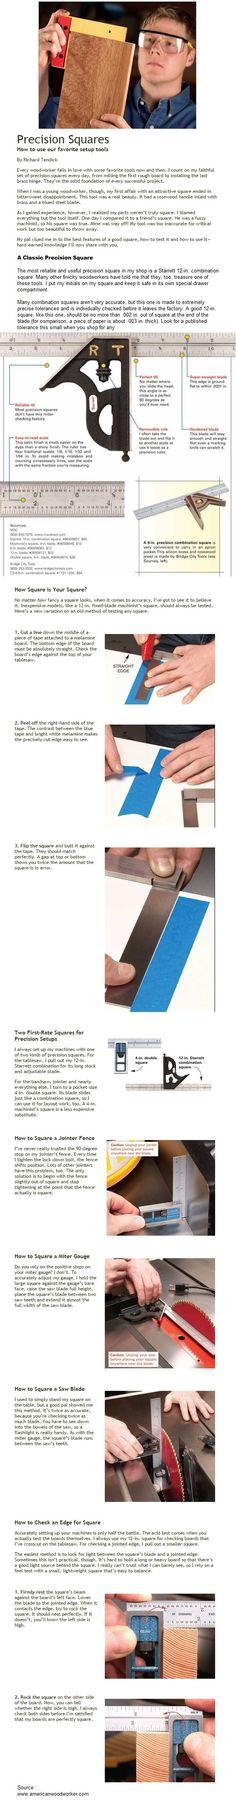 Precision Squares